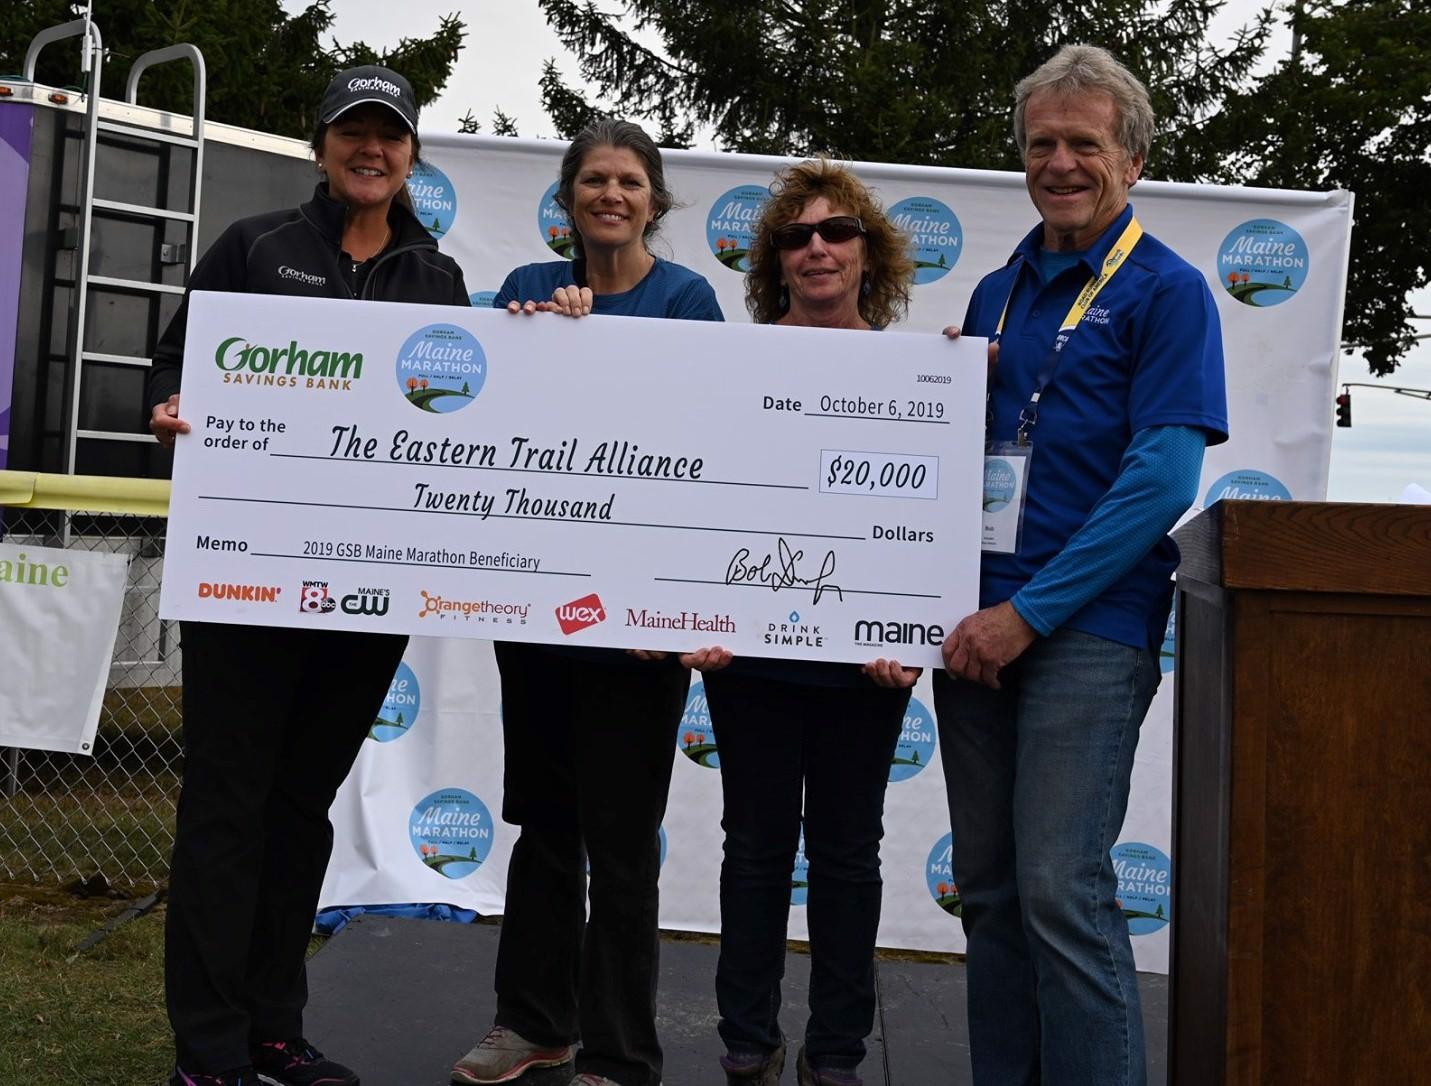 Maine Marathon presents check for $20,000 to ETA